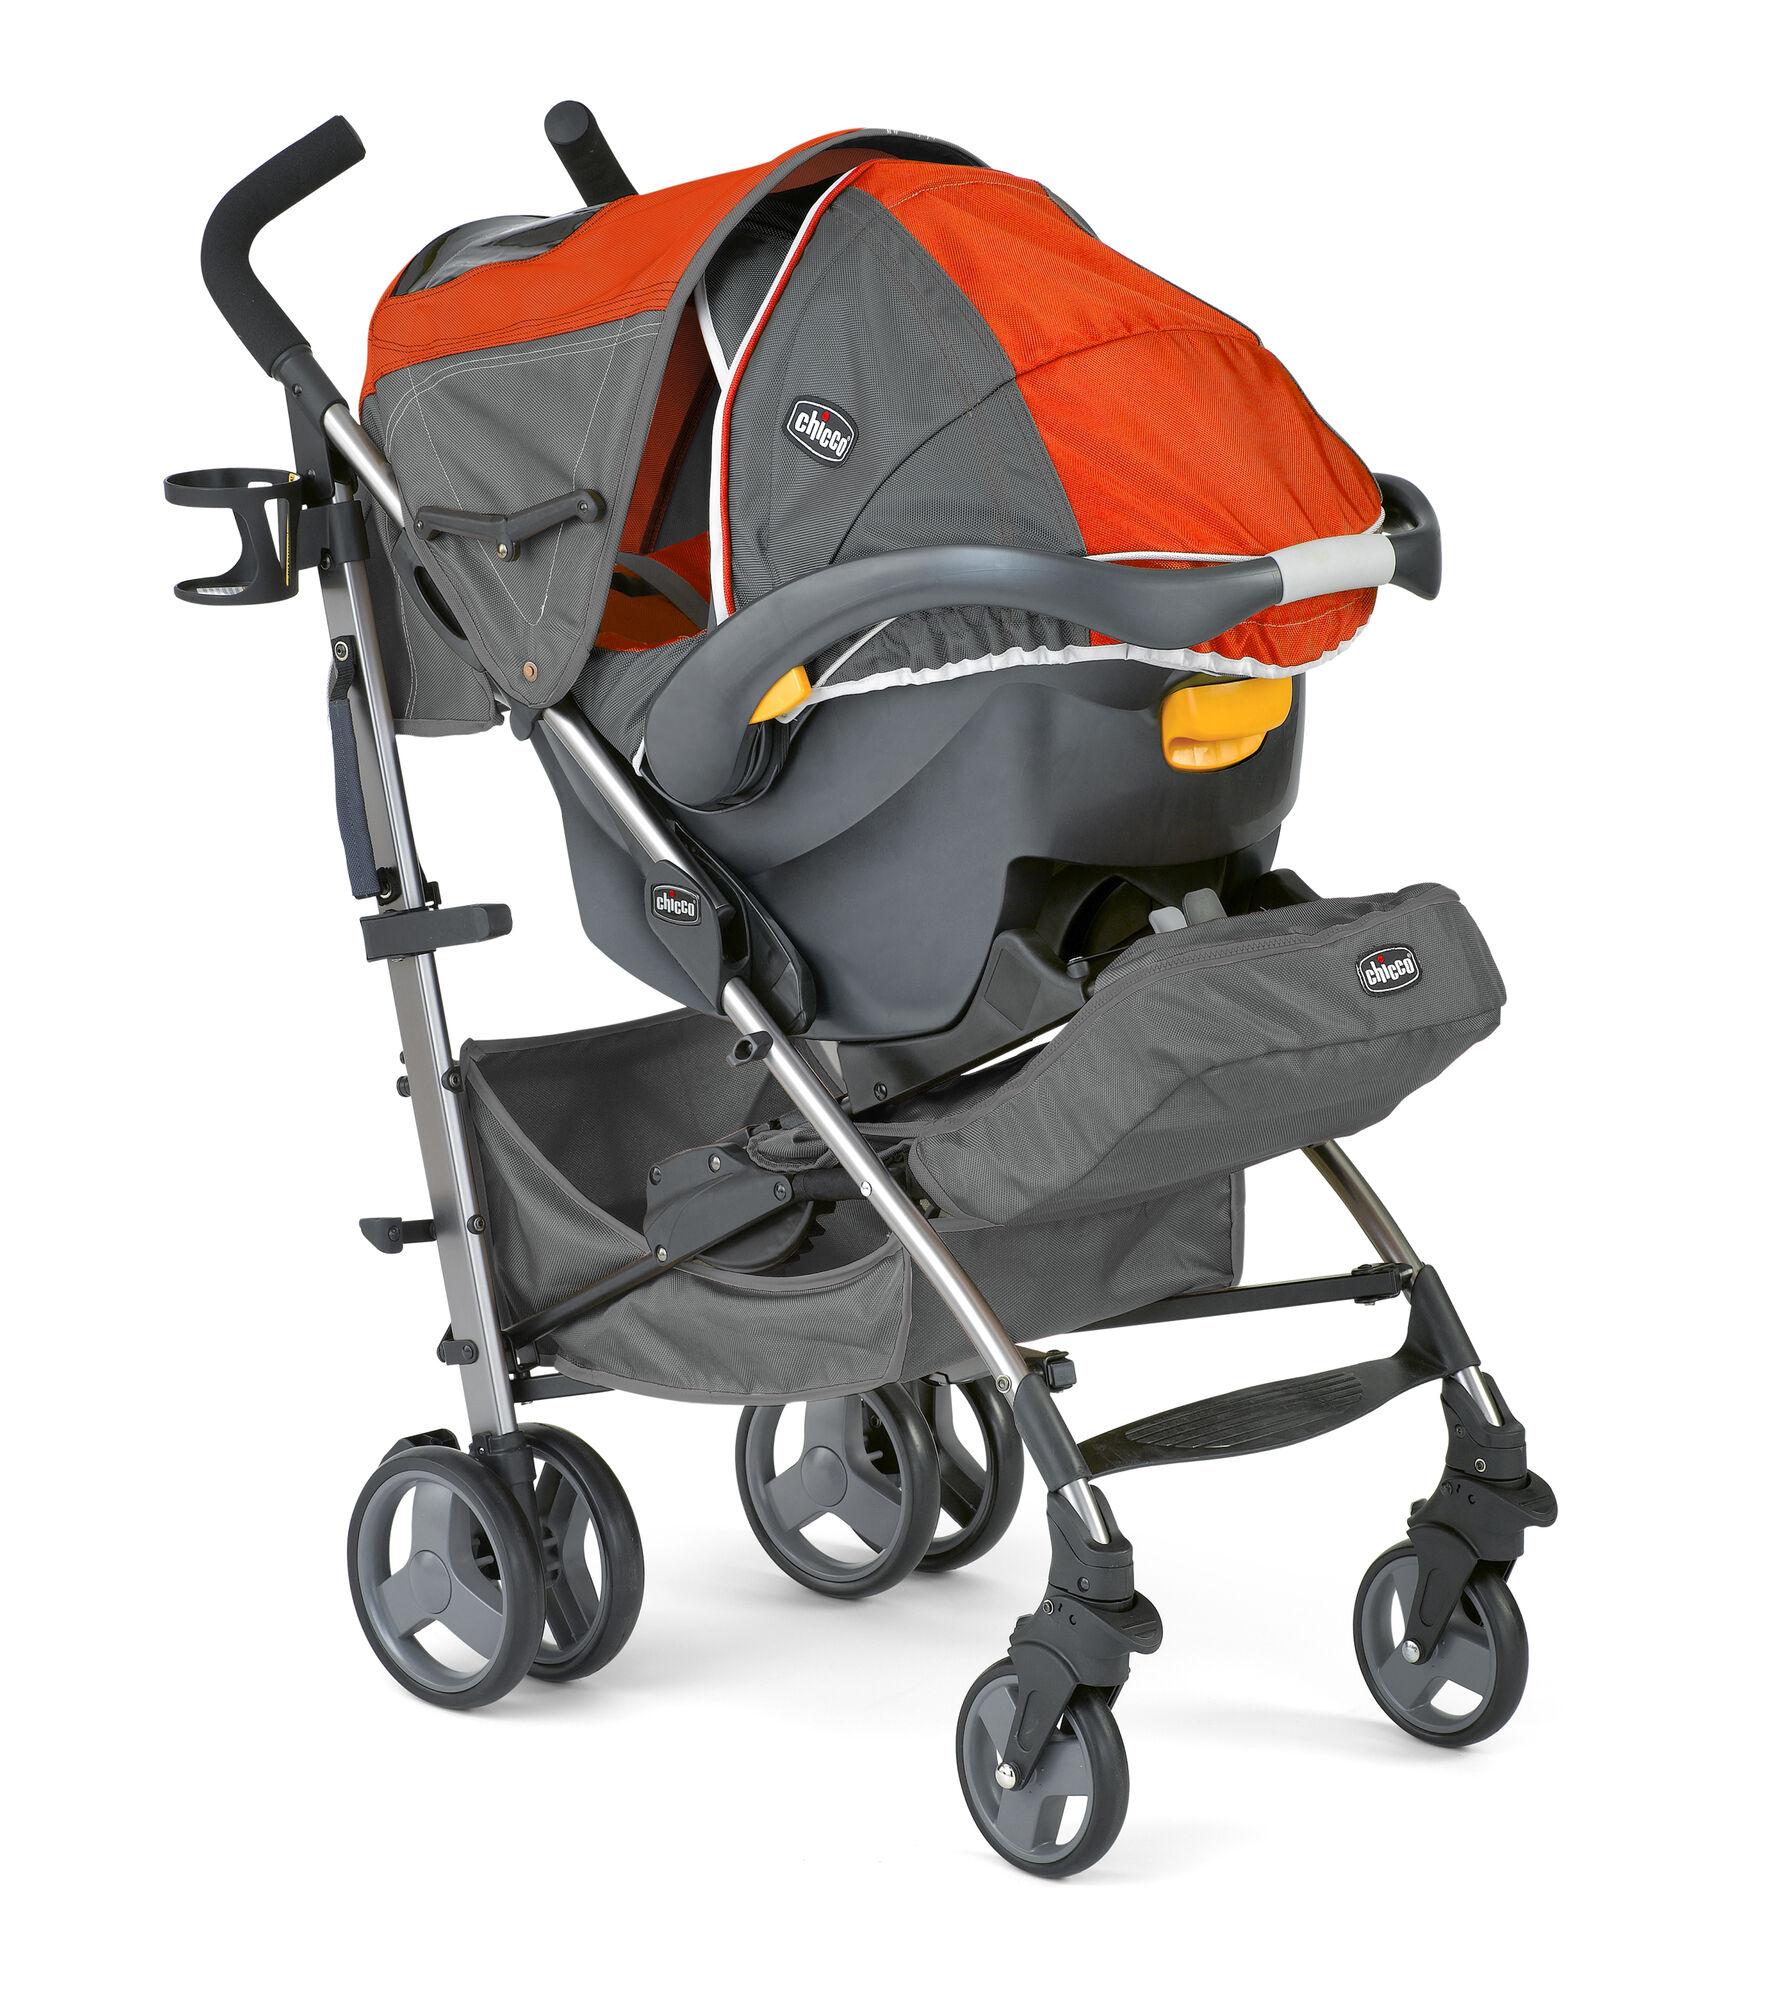 Chicco Liteway Plus 2-in-1 Stroller